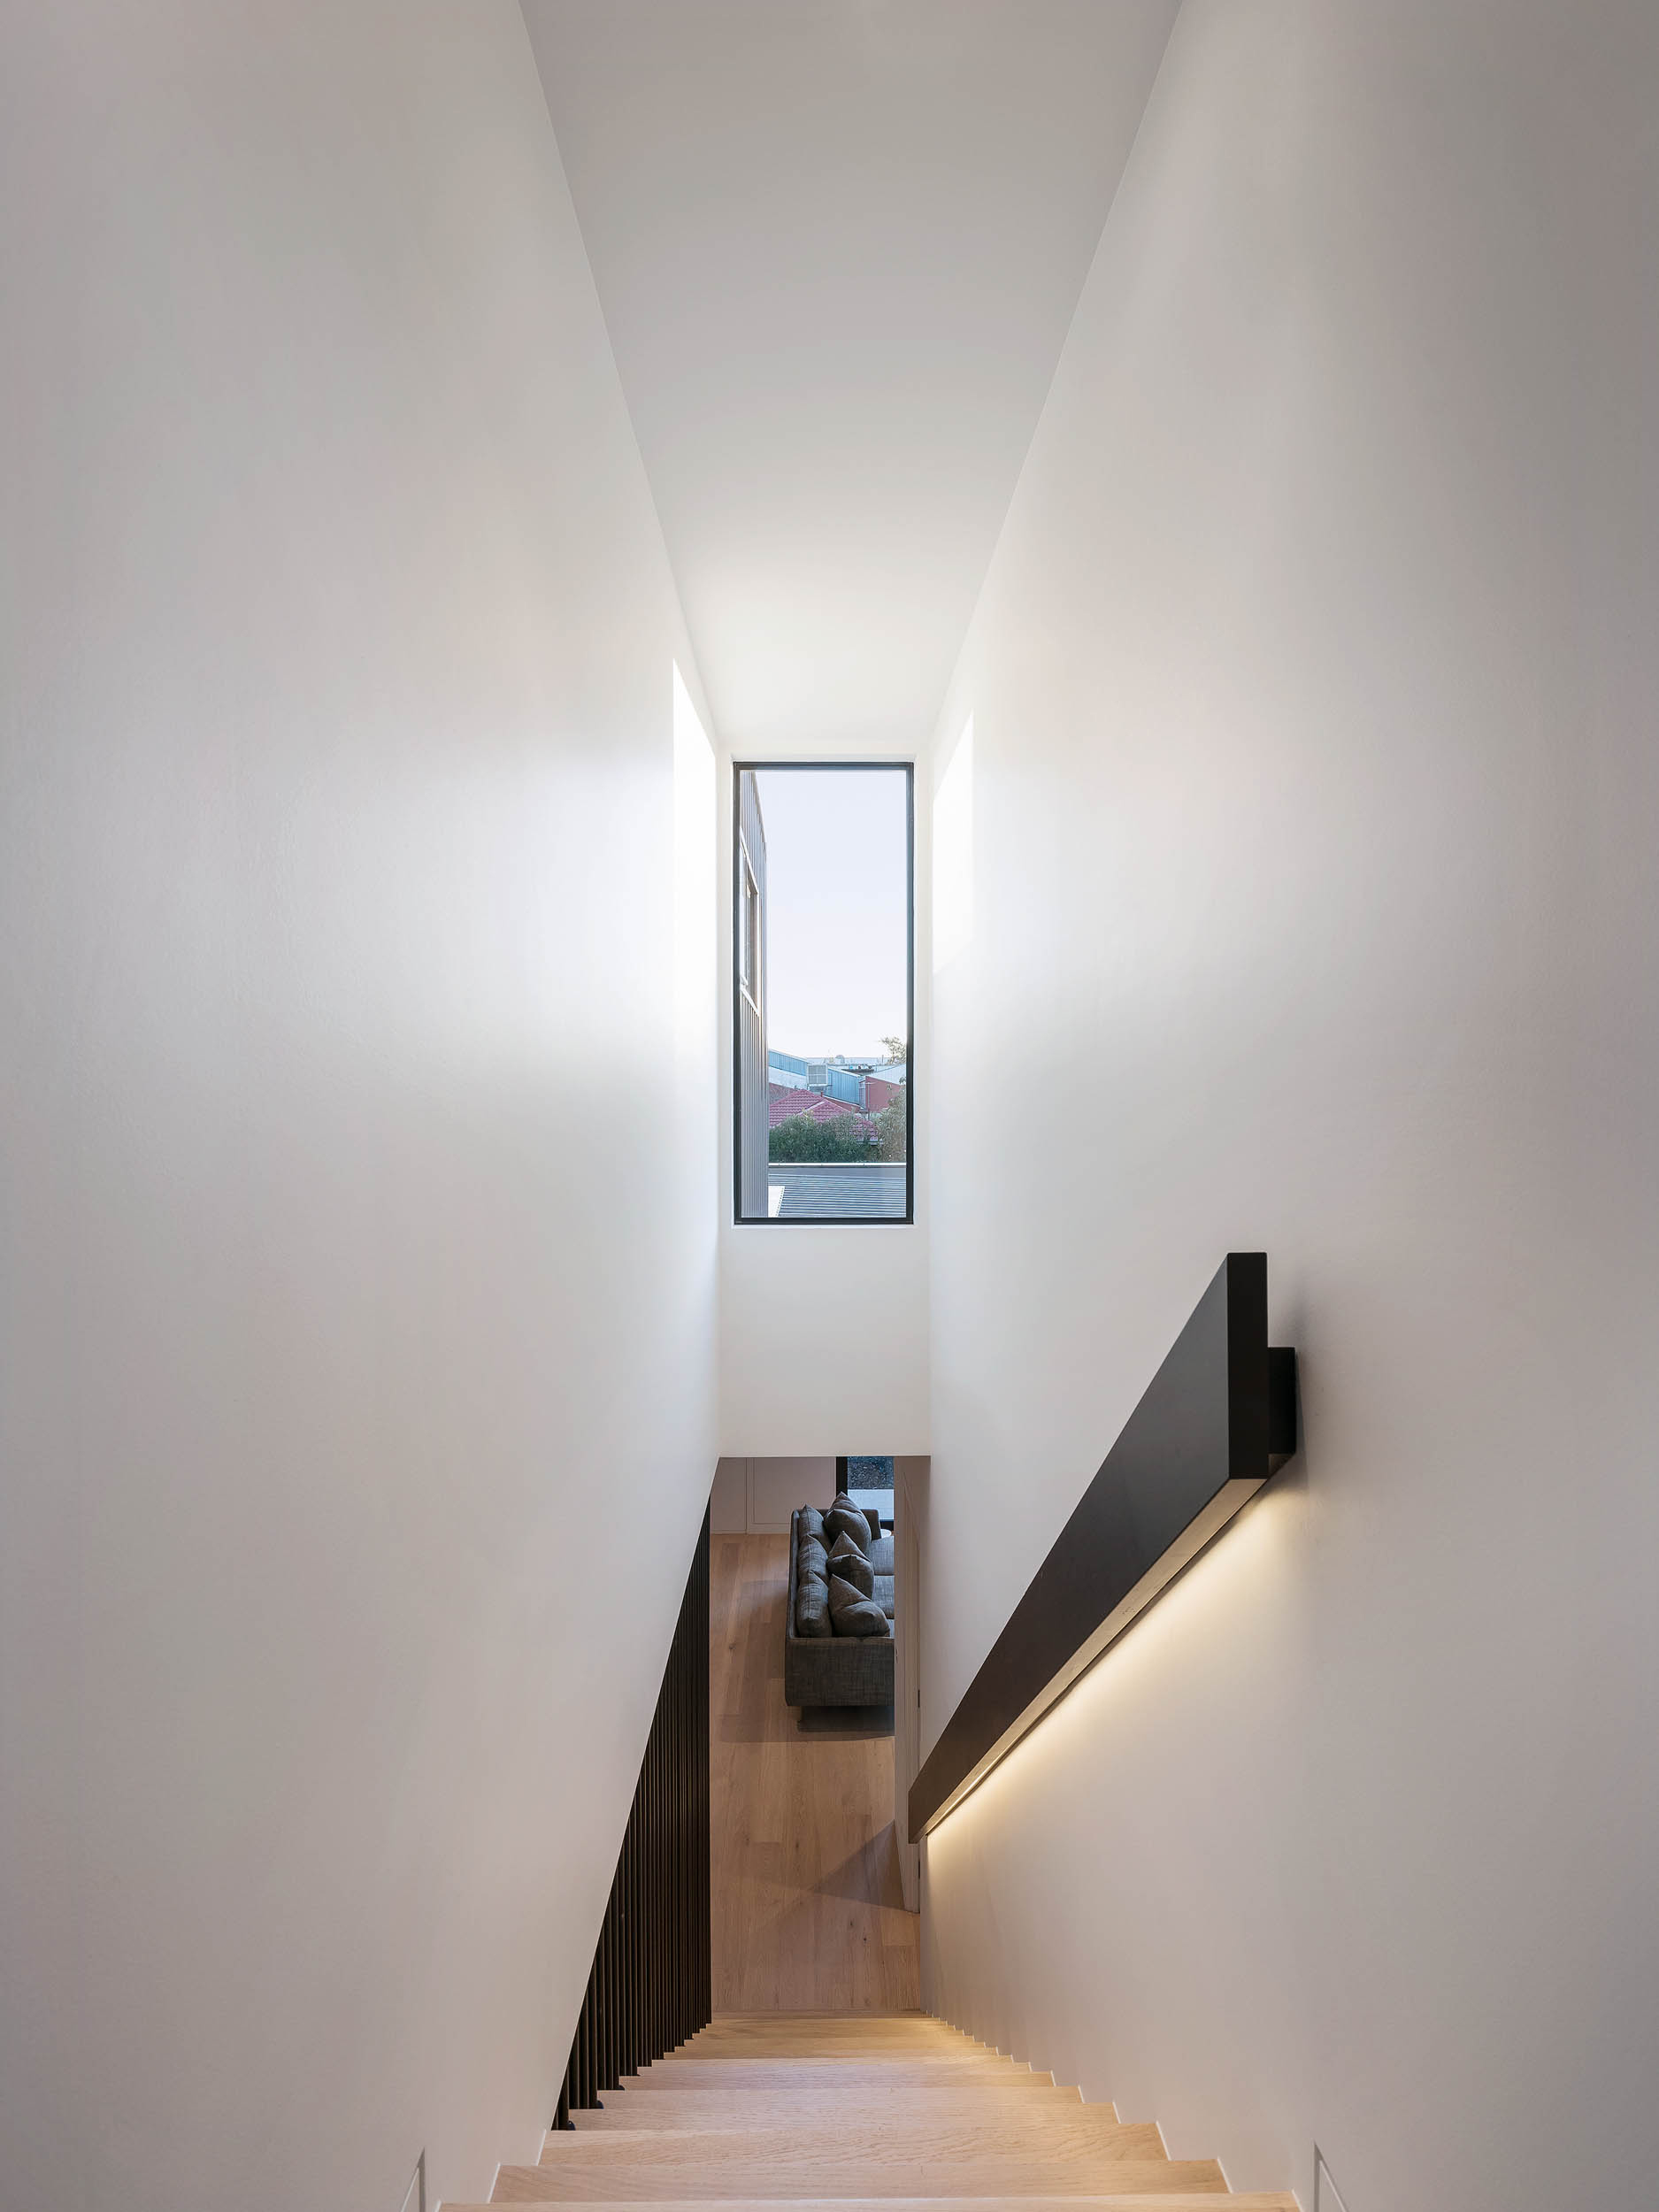 c.kairouz architects fairfield townhouse architectural interior stair design